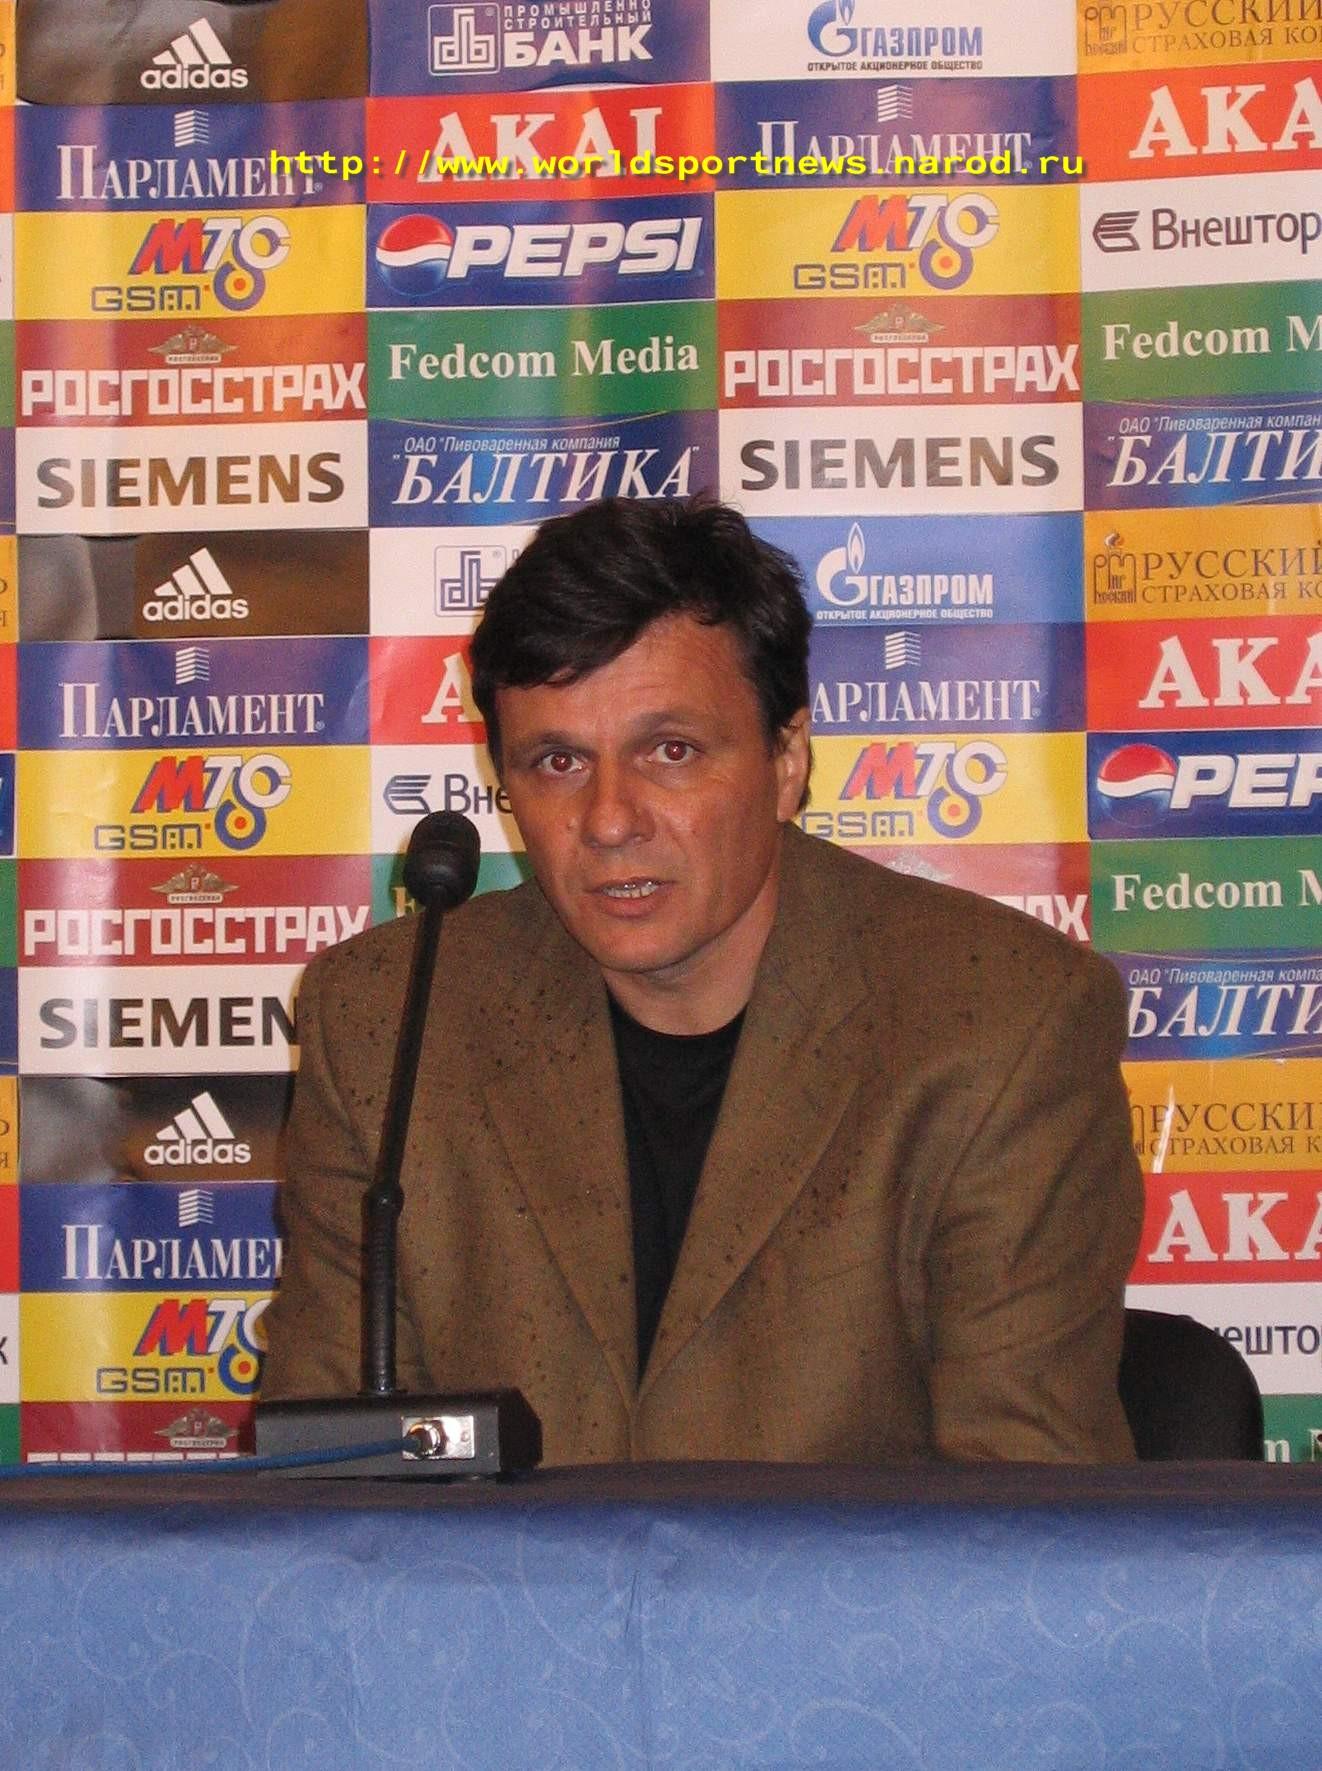 16 Мая 2005 Главный Тренер Команды «Динамо» Махачкала Г.Г.Гридин